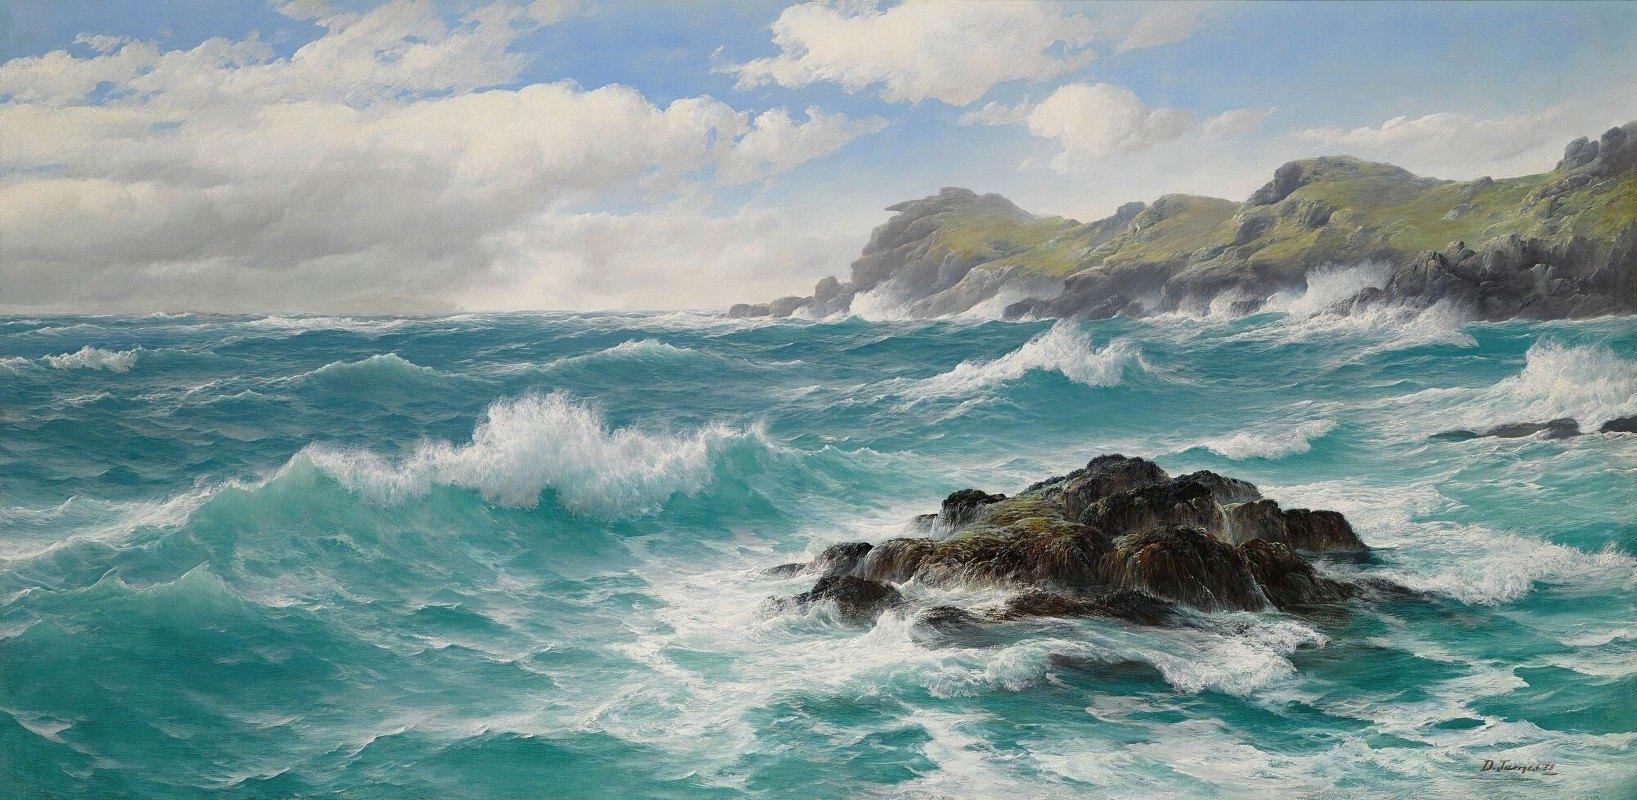 David James - Waves Off The Cornish Coast